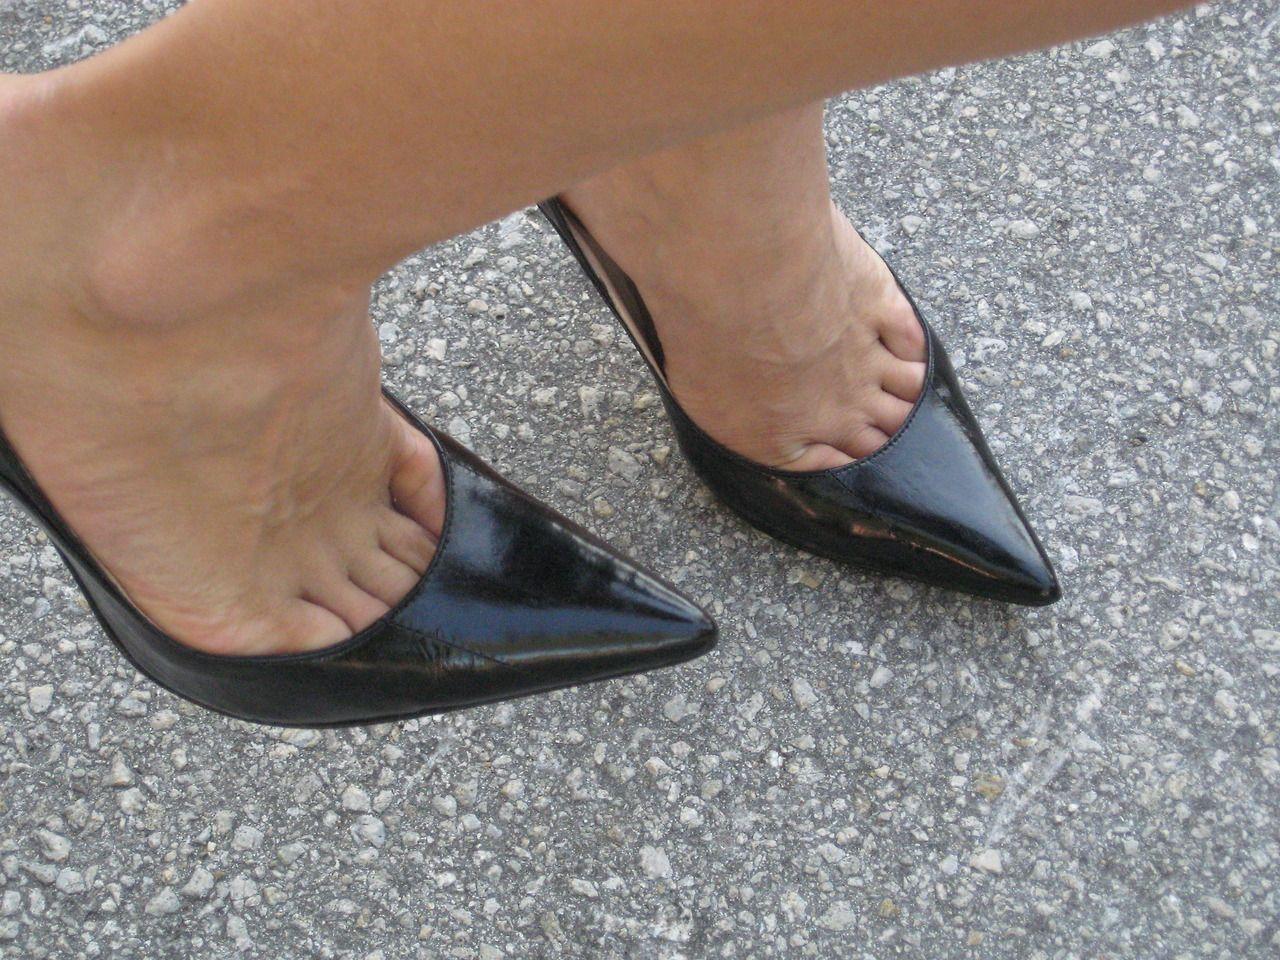 (100+) toe cleavage   Tumblr   hot shoe planet   Pinterest ...